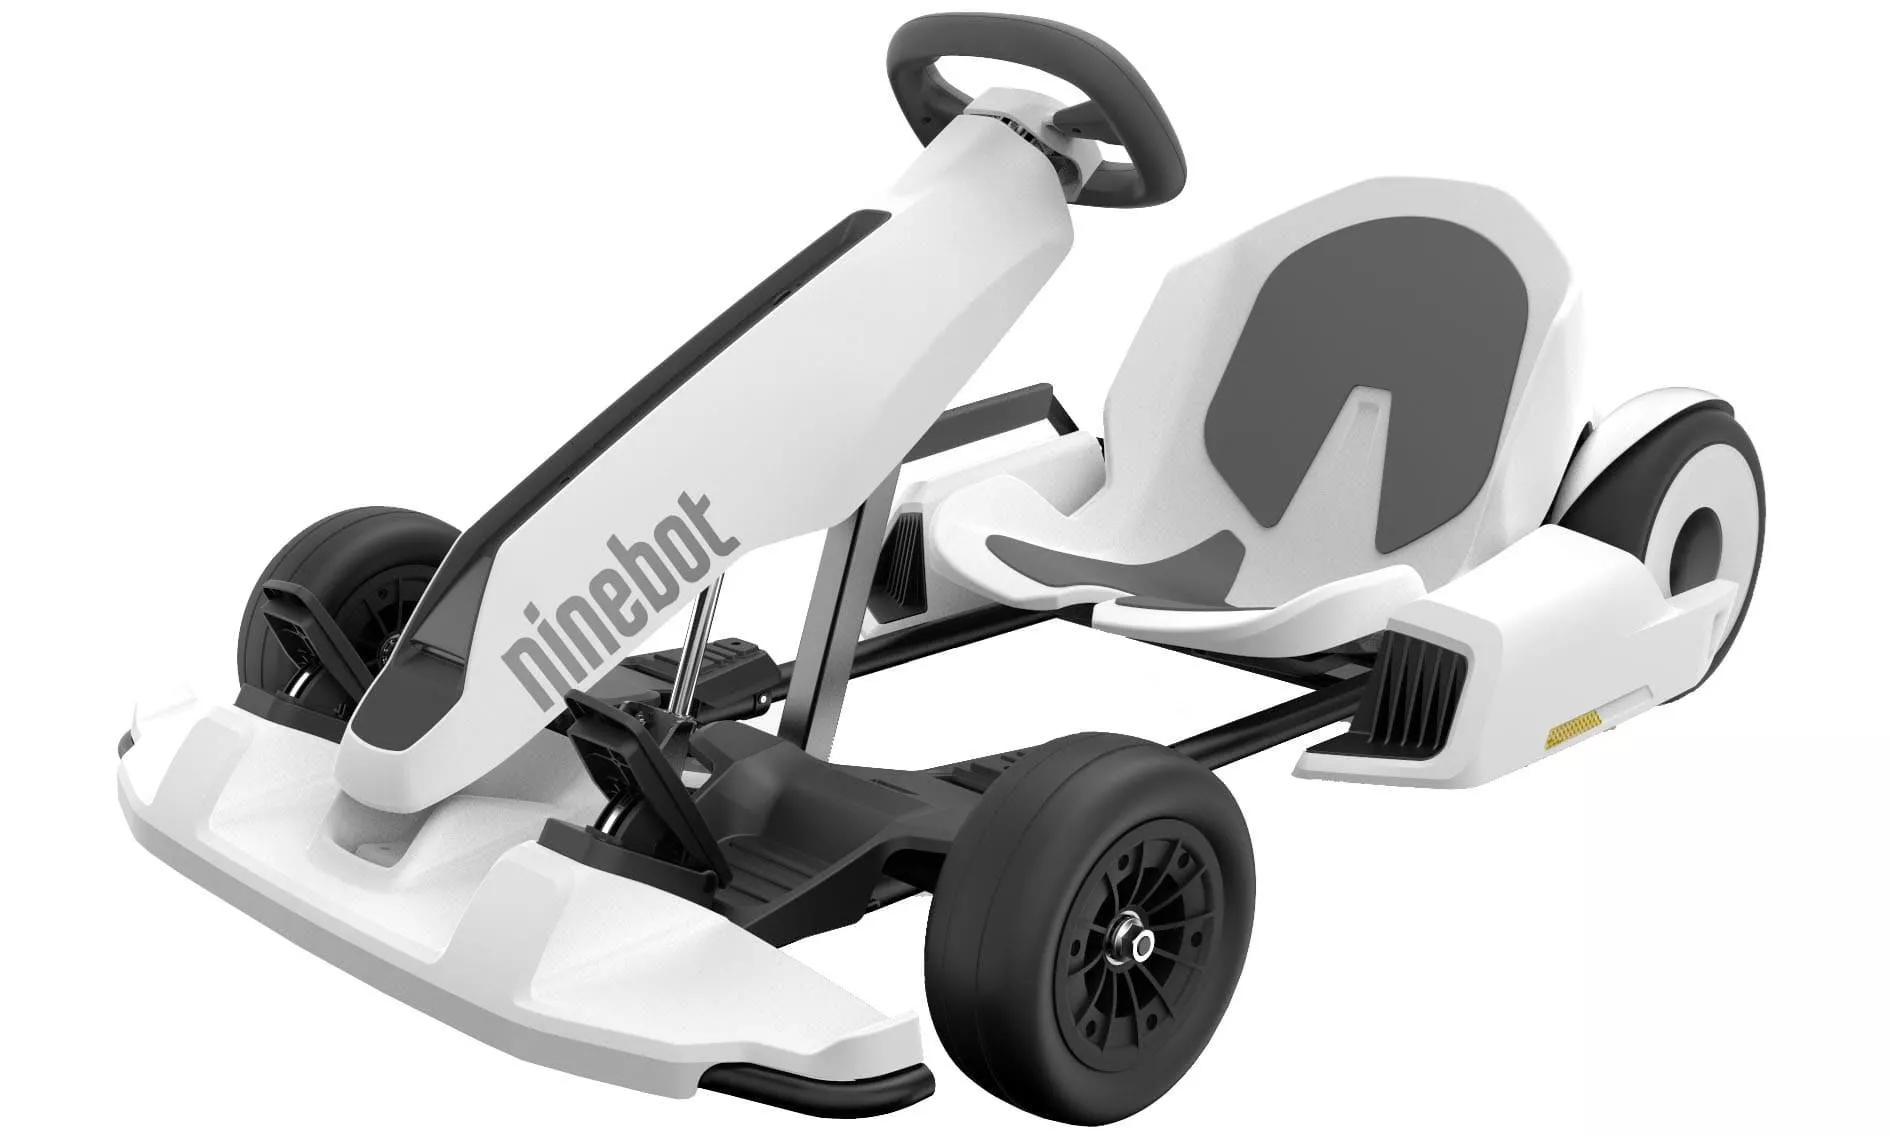 Ninebot S jako gokart elektryczny